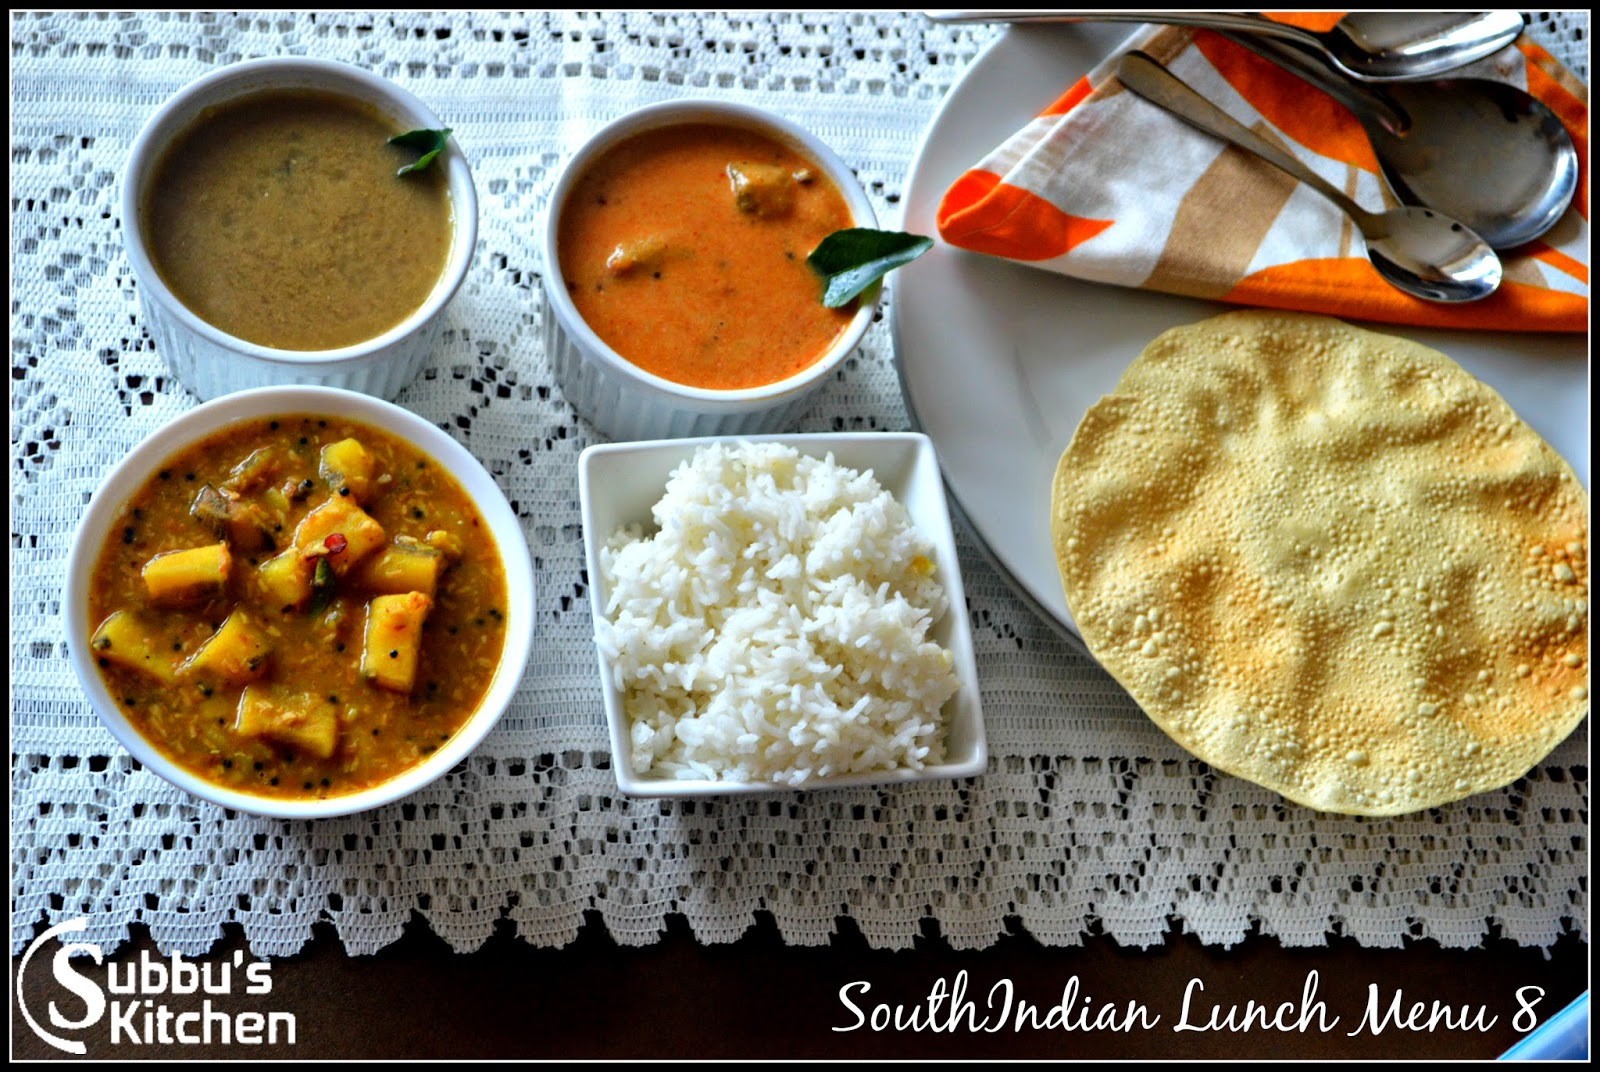 South Indian Lunch Menu 8 - Thengai Araitha Kuzhambu, Vazhakaai Puliyita Kootu, Poondu Rasam and Pappad